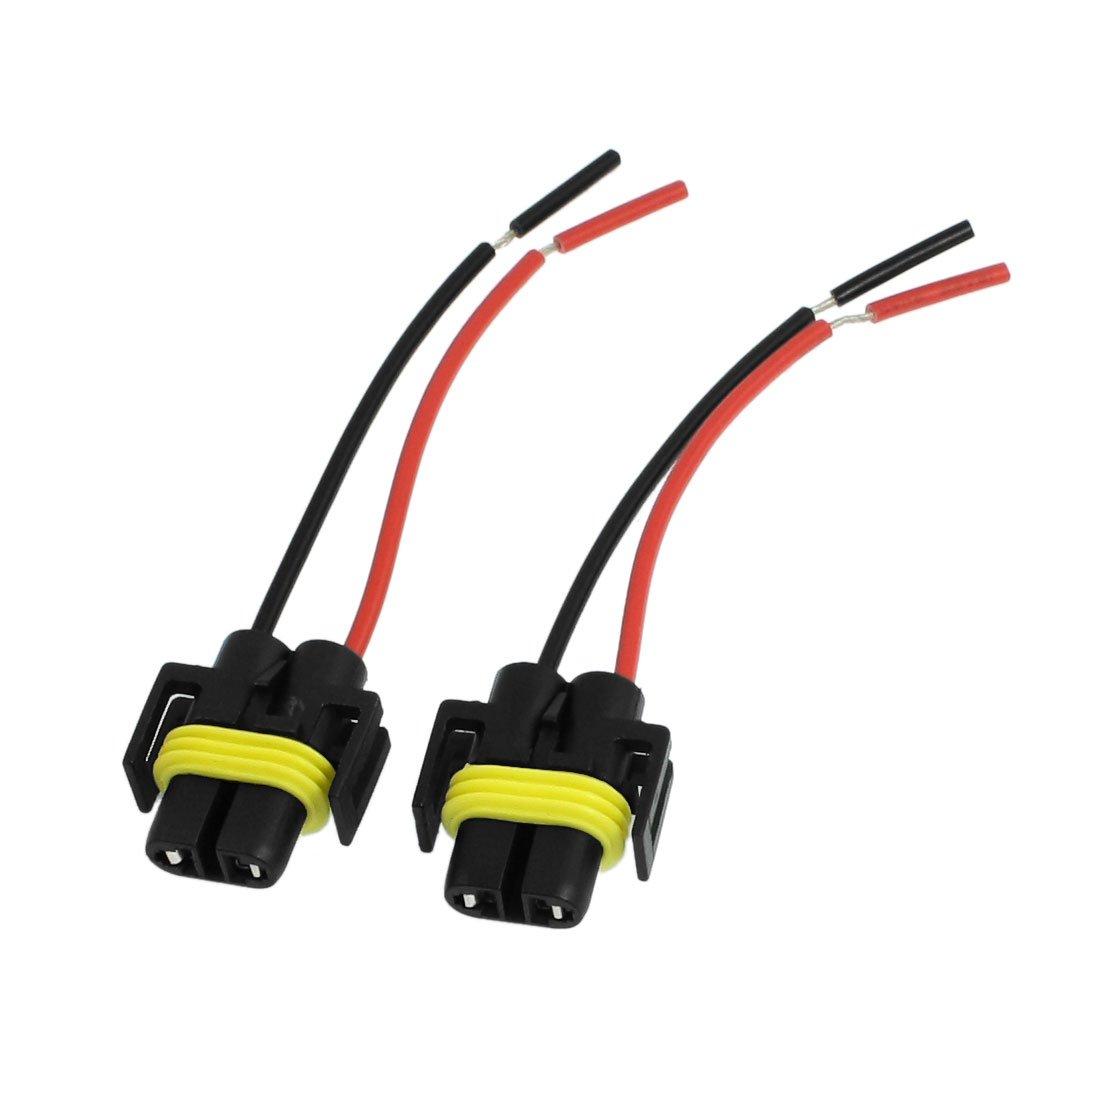 uxcell 2 Pcs Auto Car Headlight H11 Socket Harness Plastic Connector